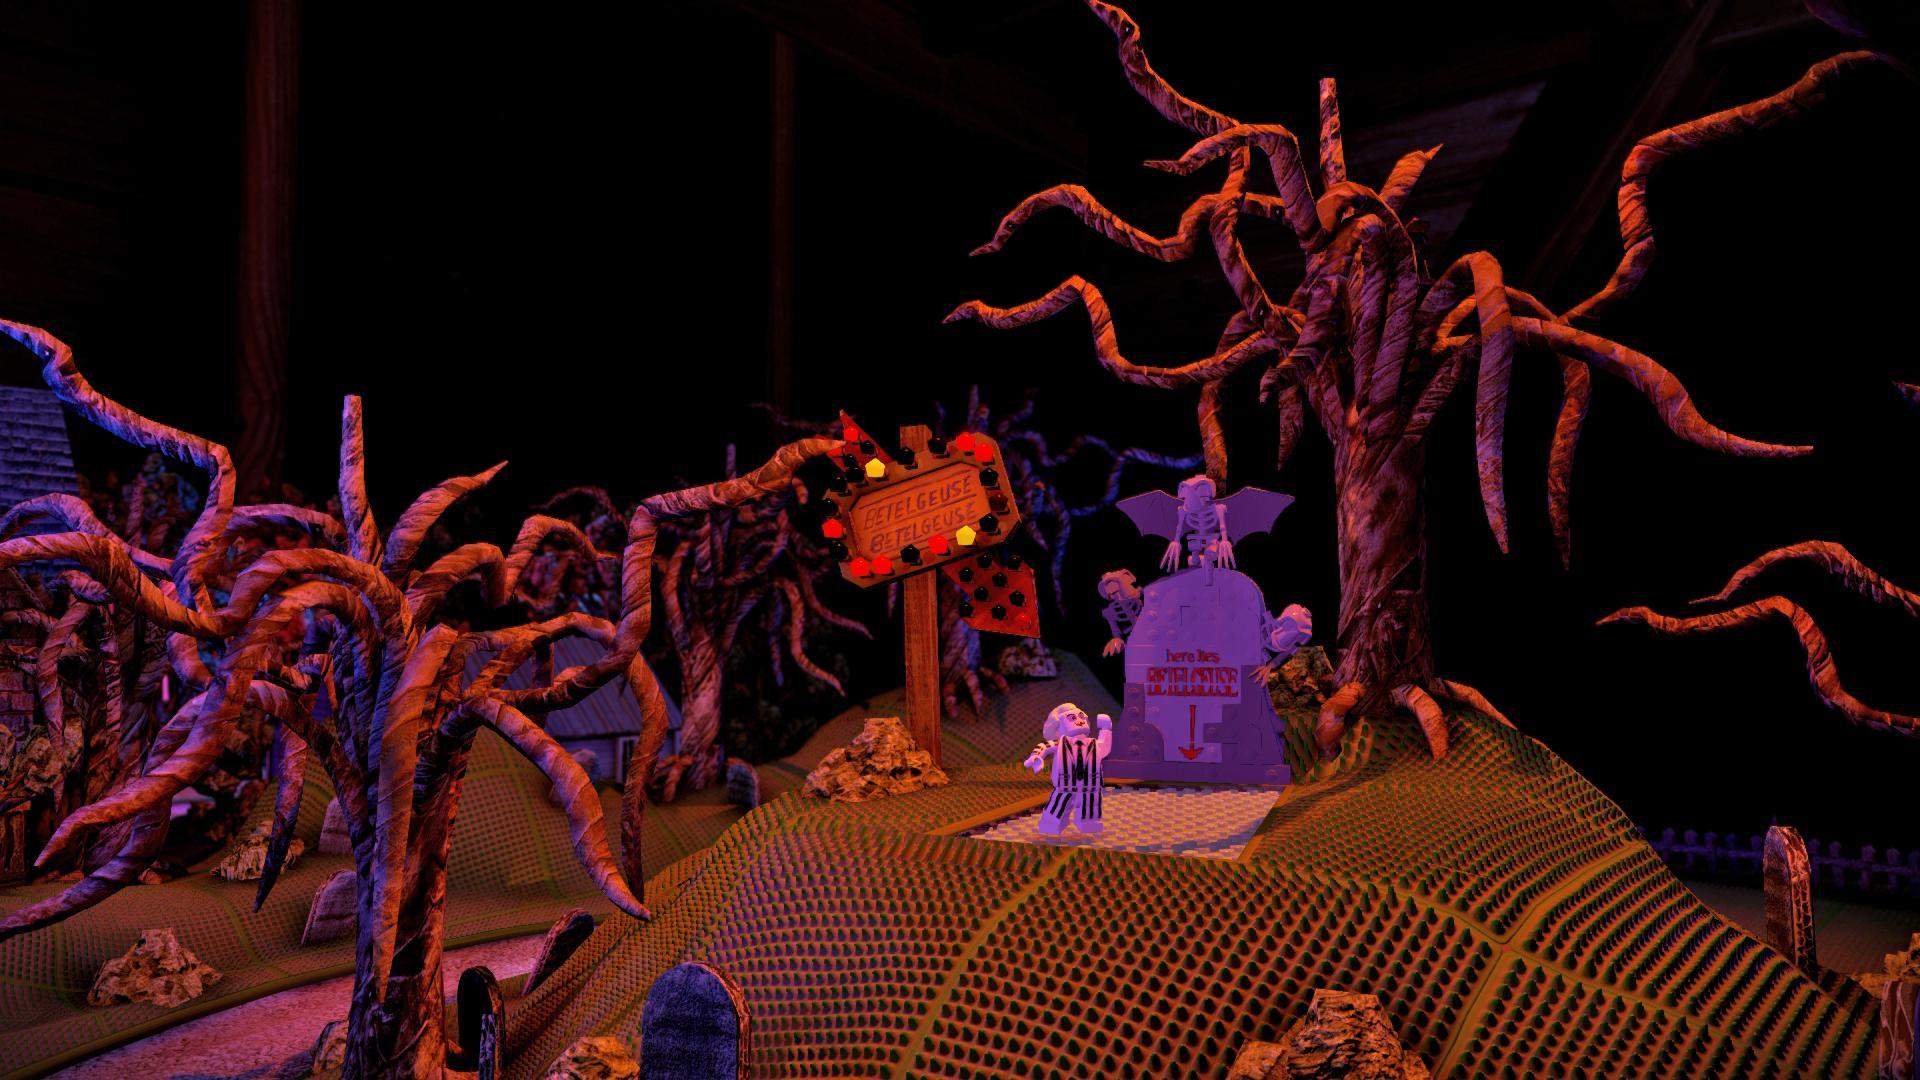 LEGO Dimensions - Beetlejuice